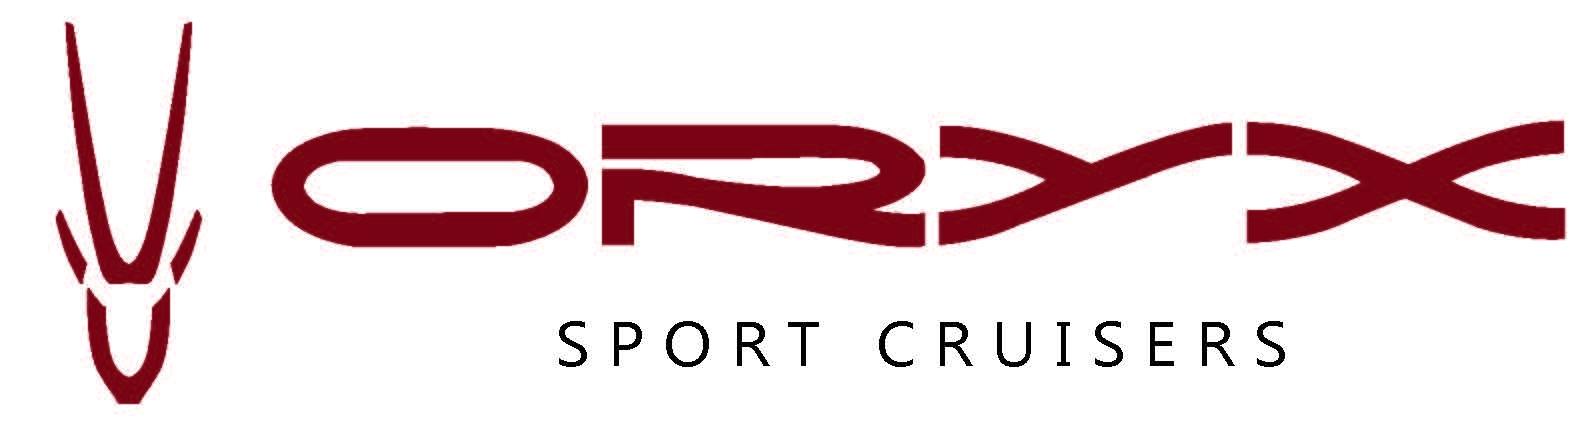 Oryx Sport Cruiser